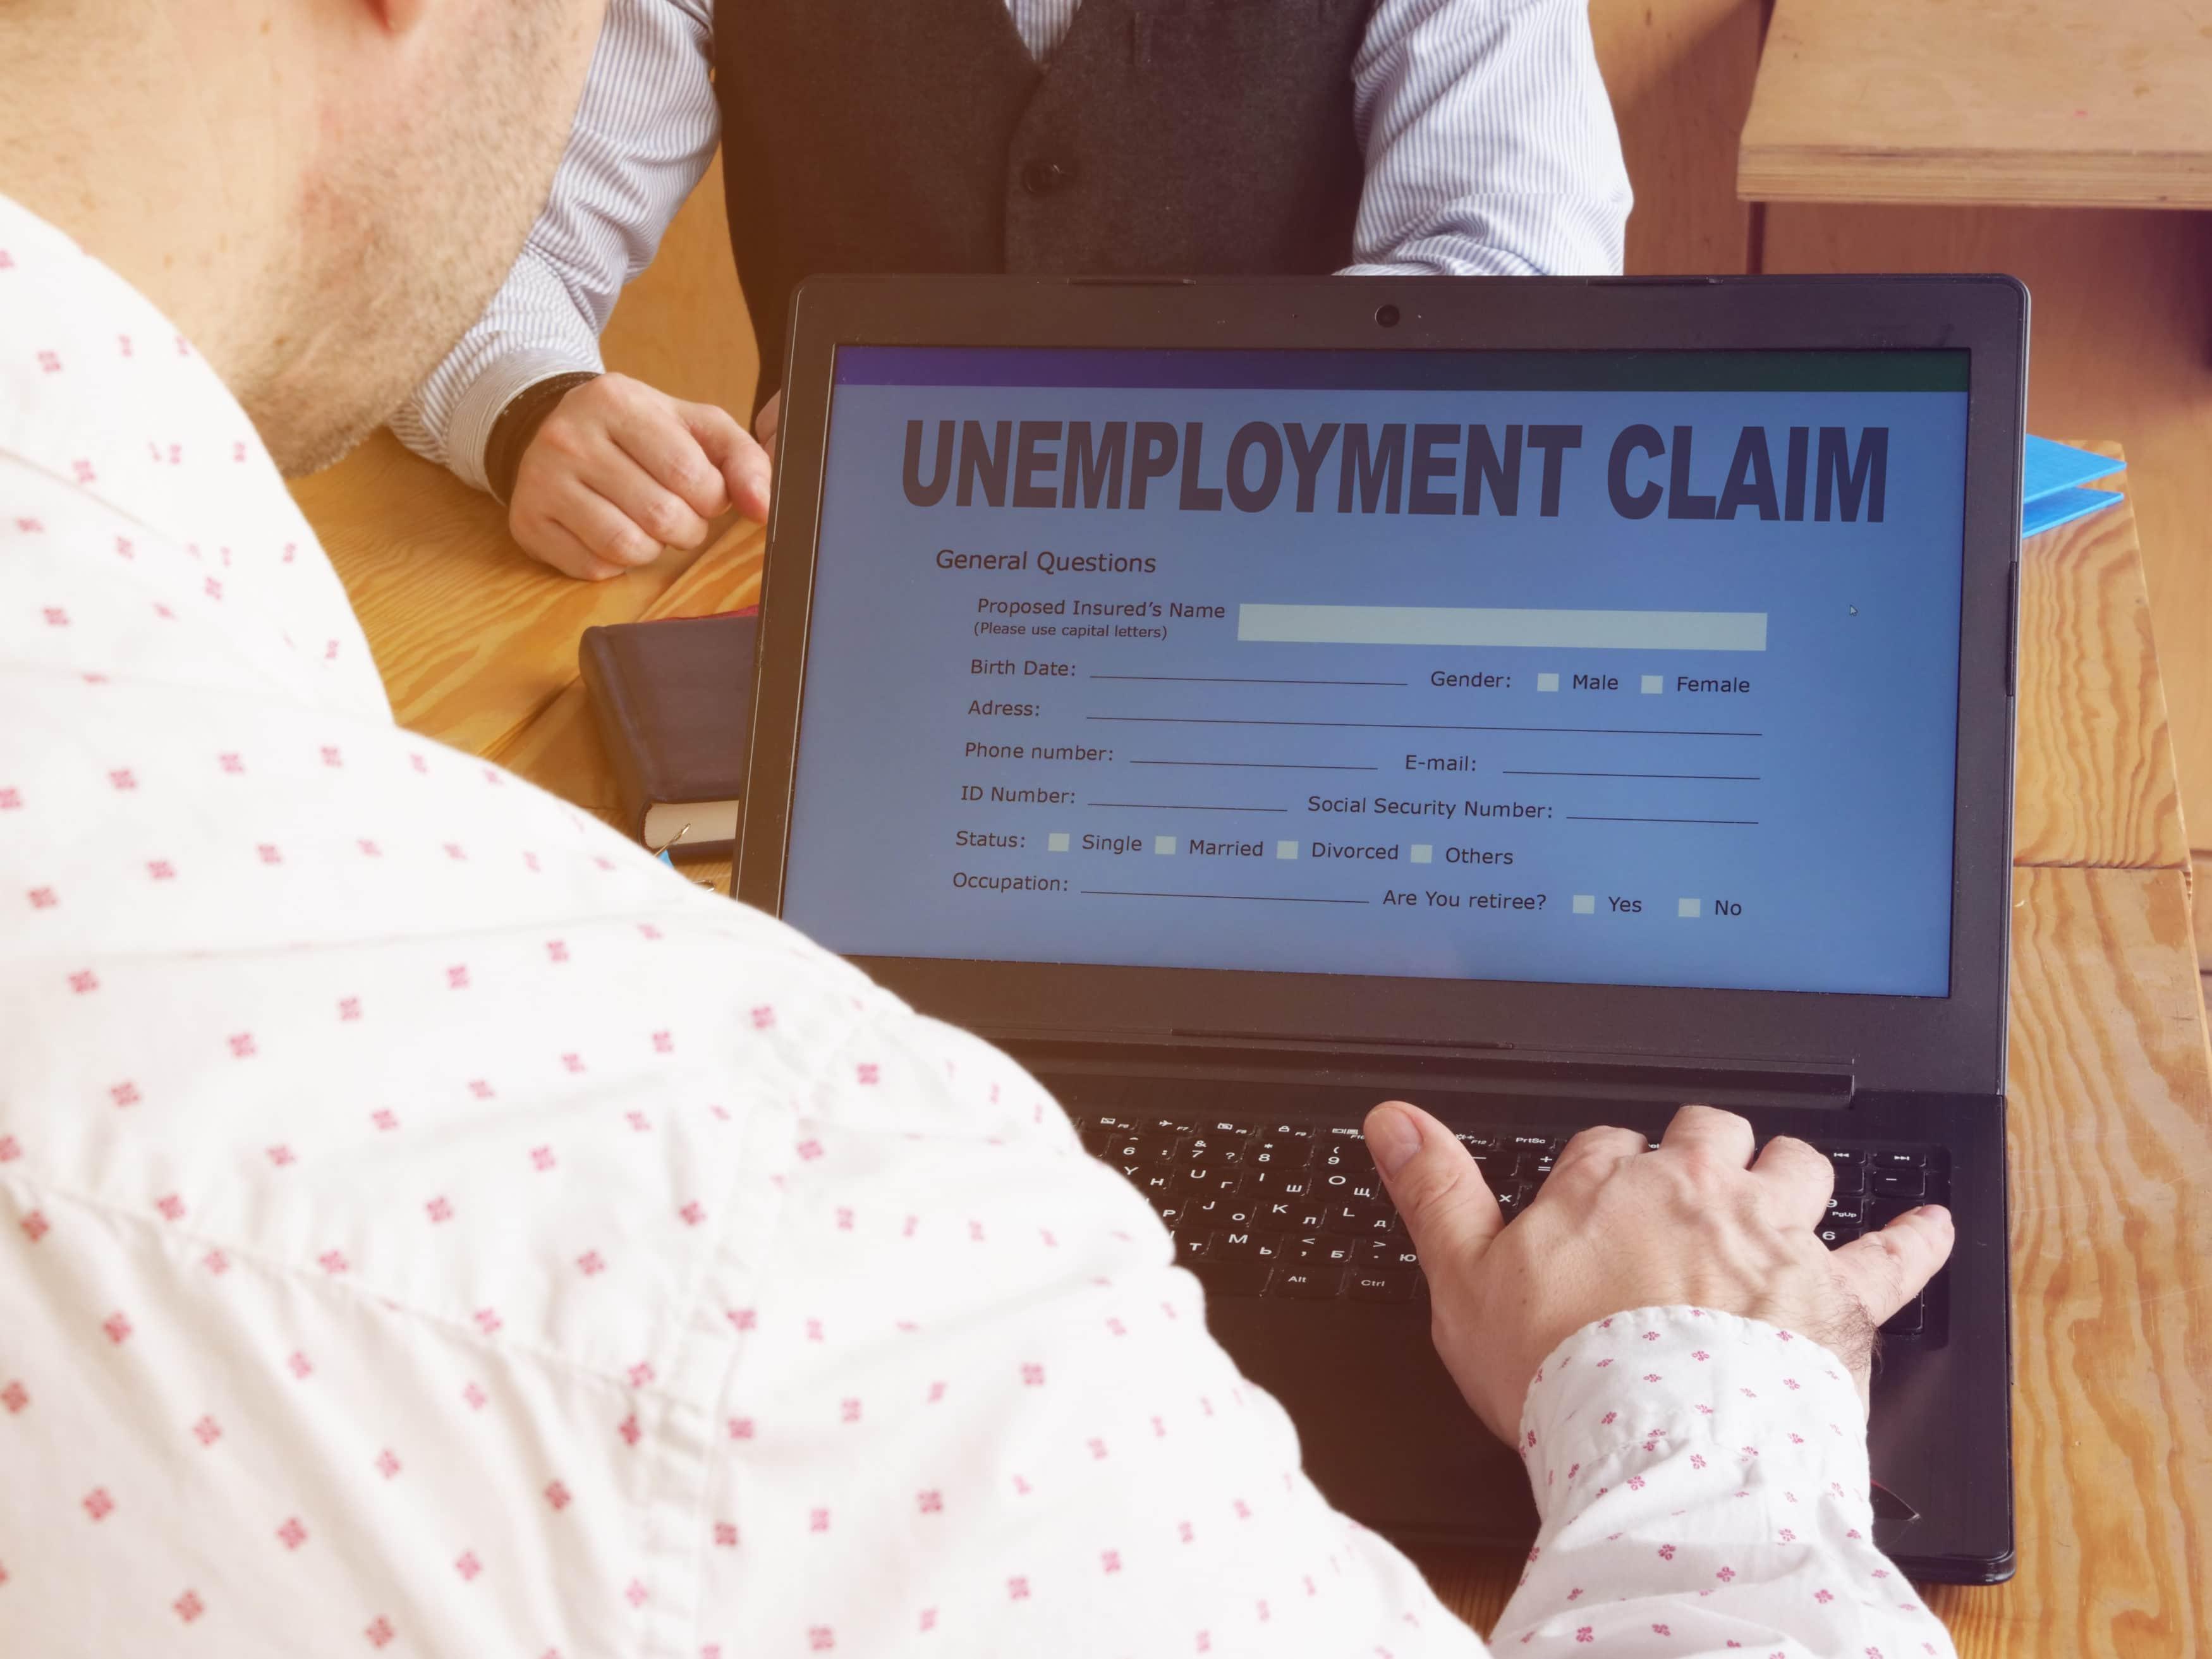 unemployment-system-3500x2625.jpeg